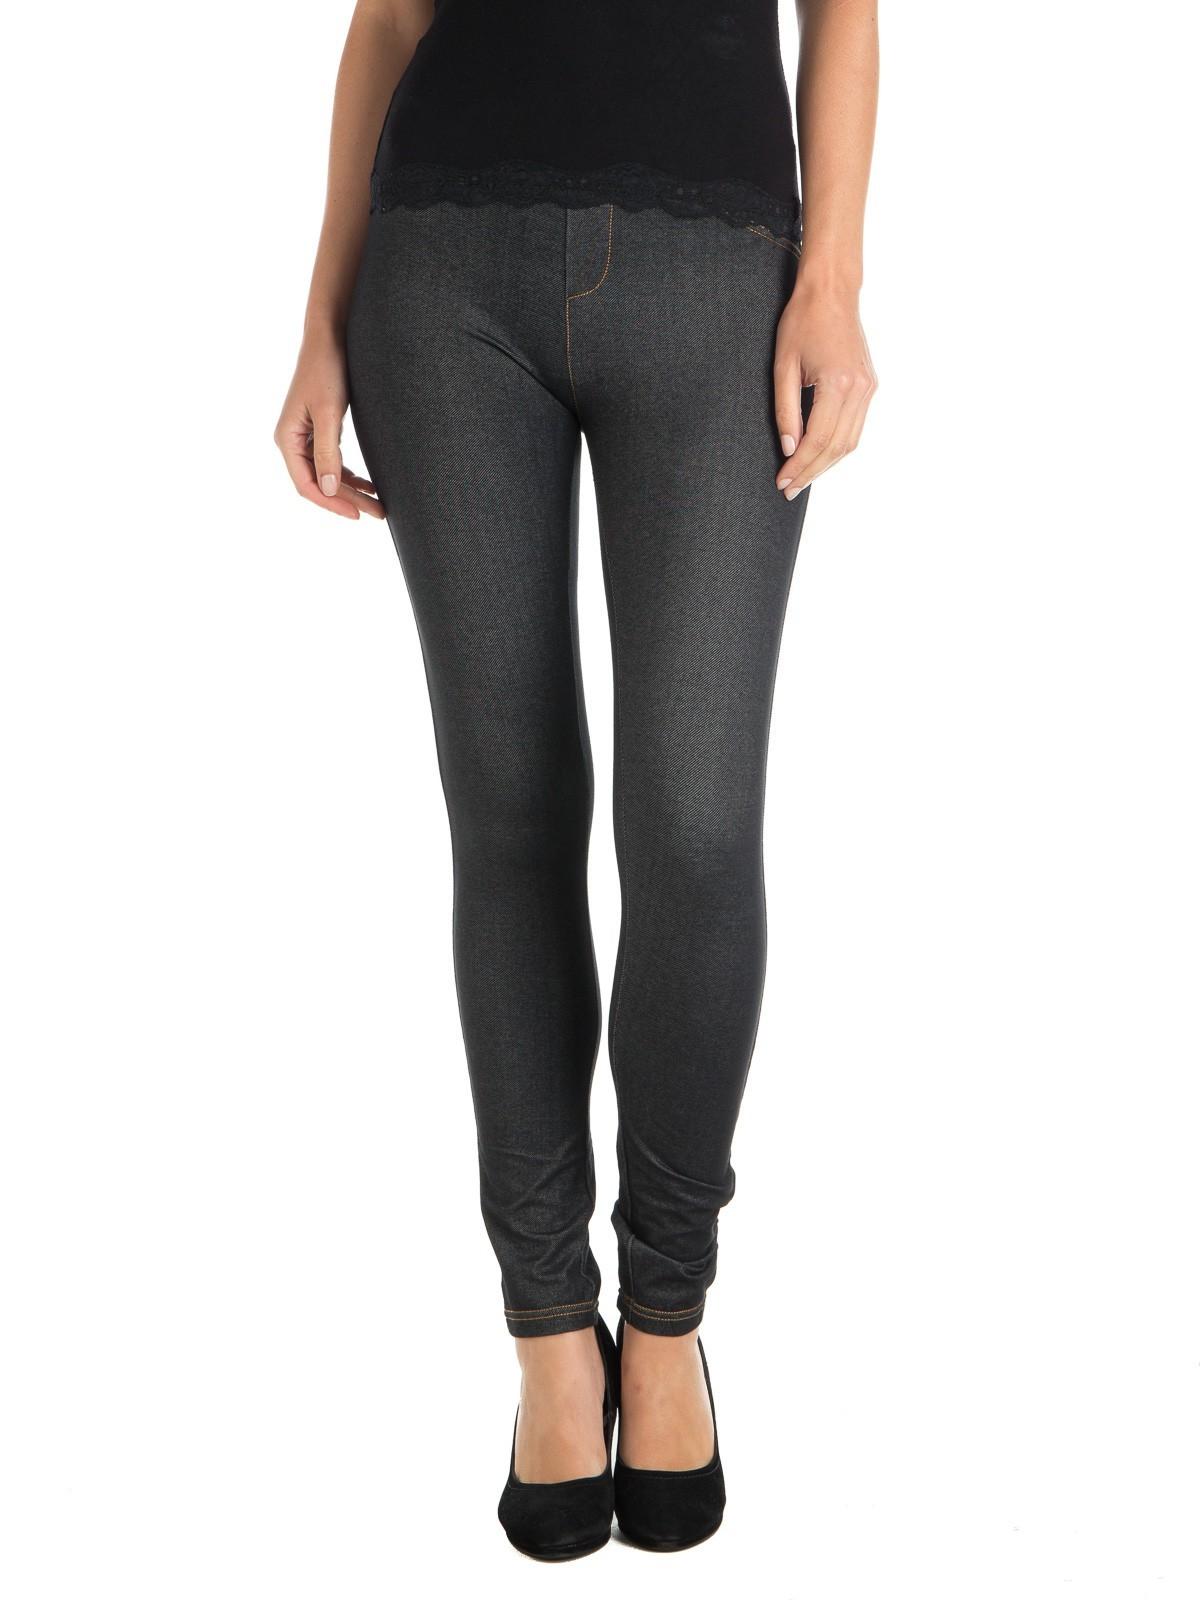 0081ece02c035 Legging effet jean femme - DistriCenter